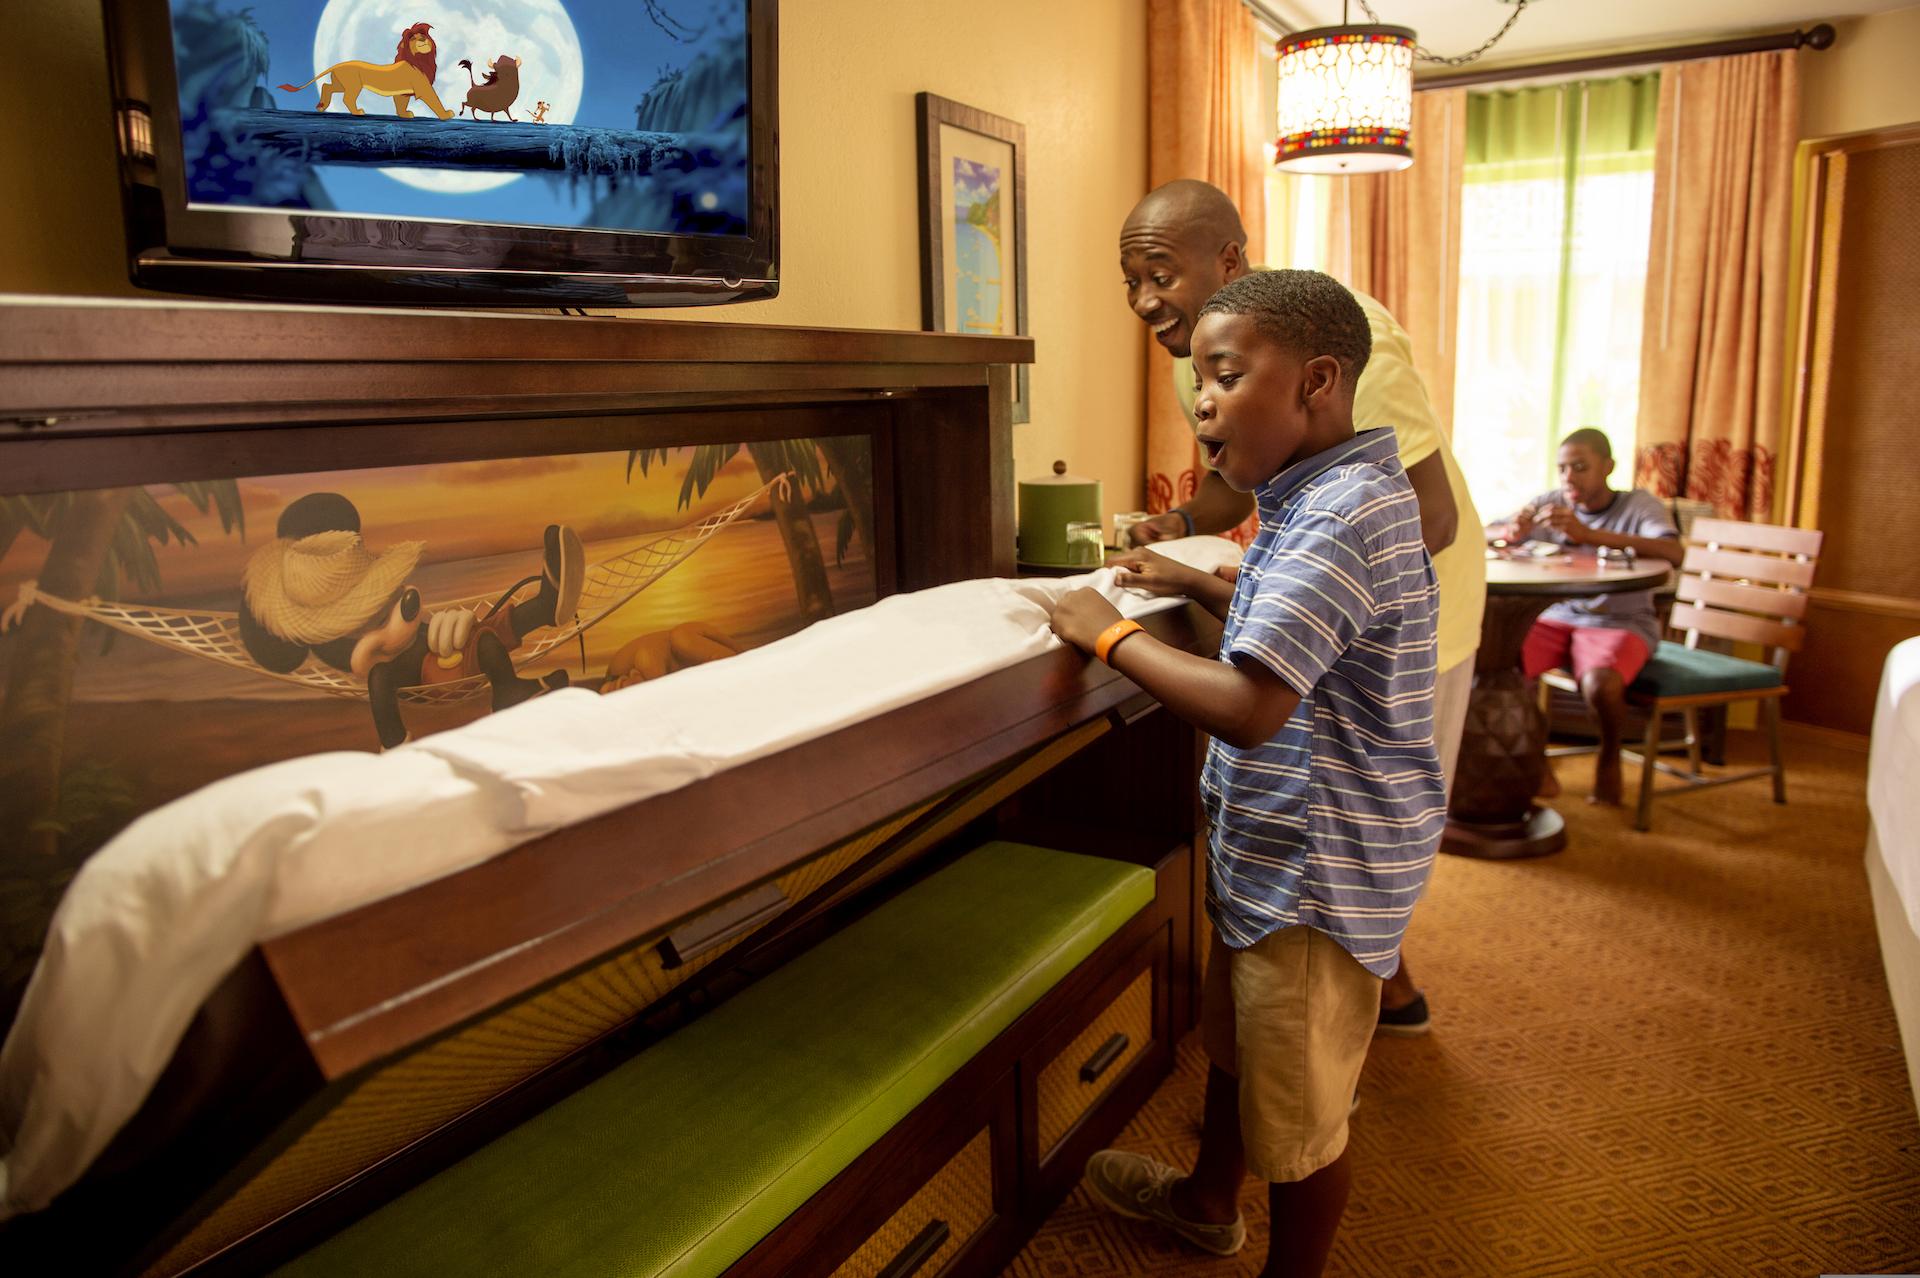 Walt Disney World Resorts Child Sized Pulldown Bed